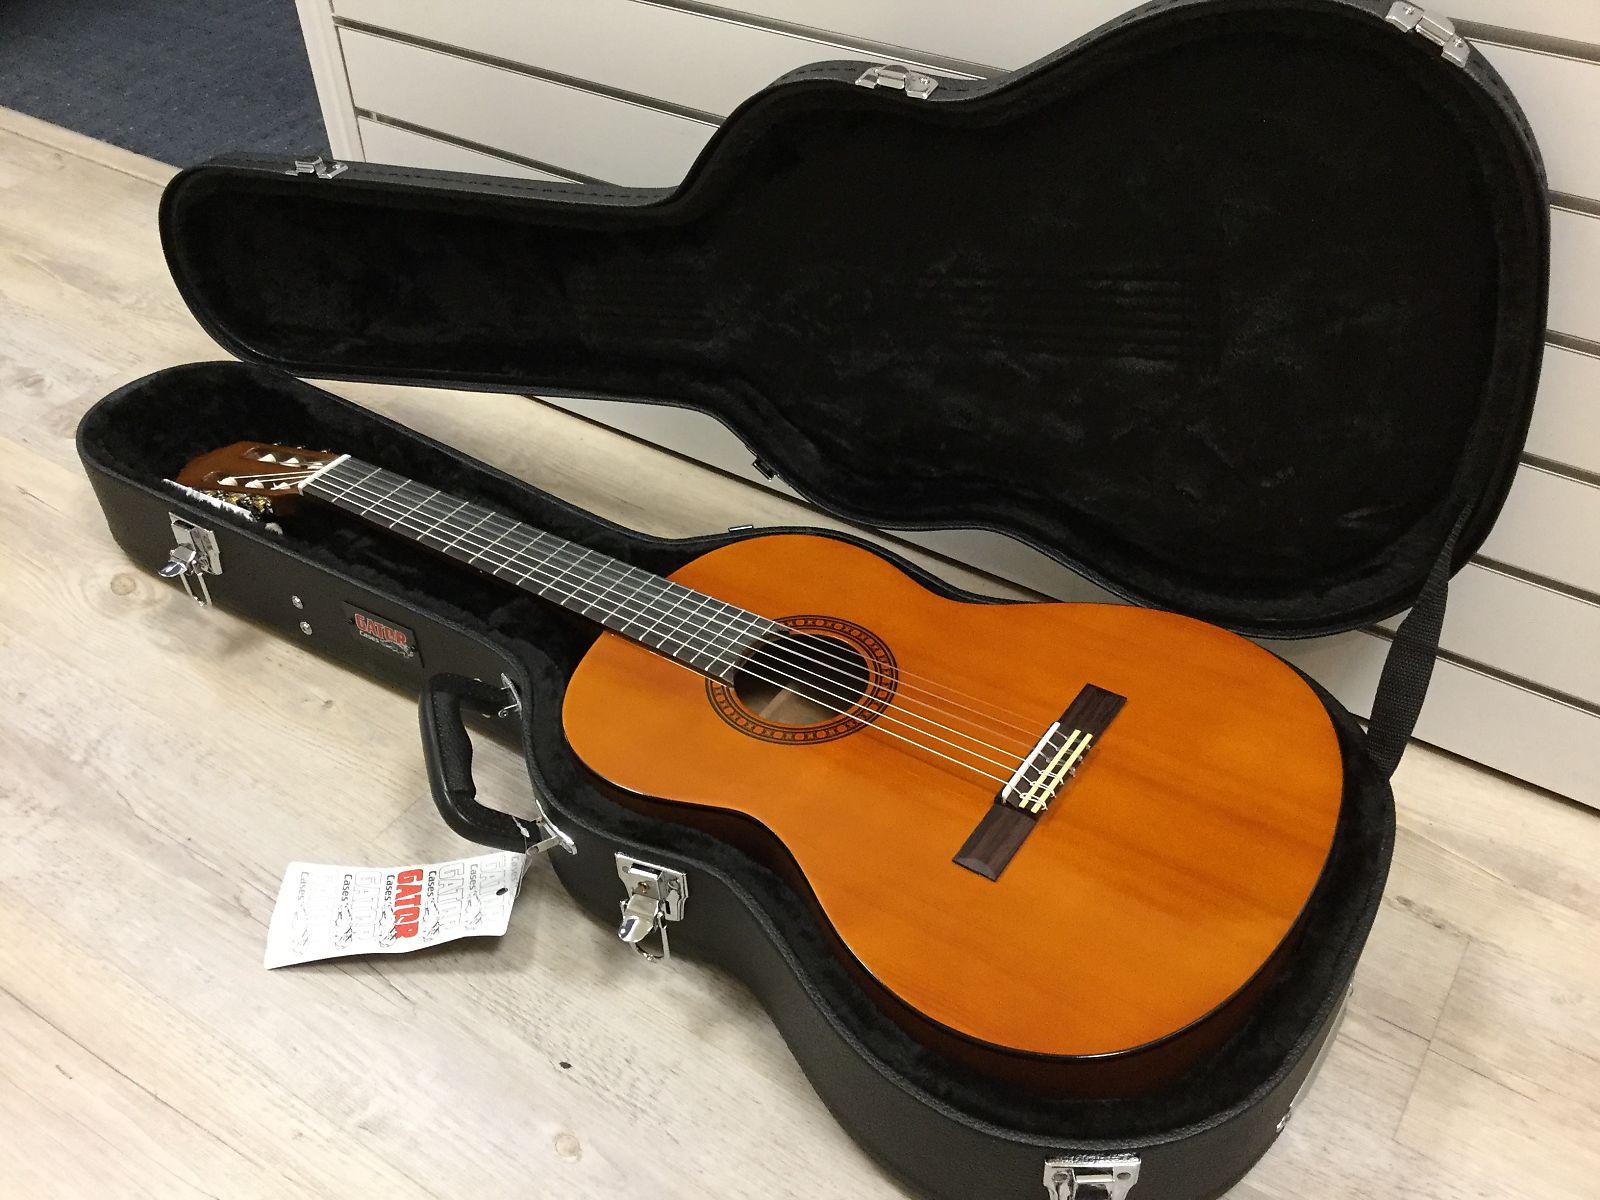 b09f2c54eee Yamaha CGS103 3/4 size classical guitar with gator hard case